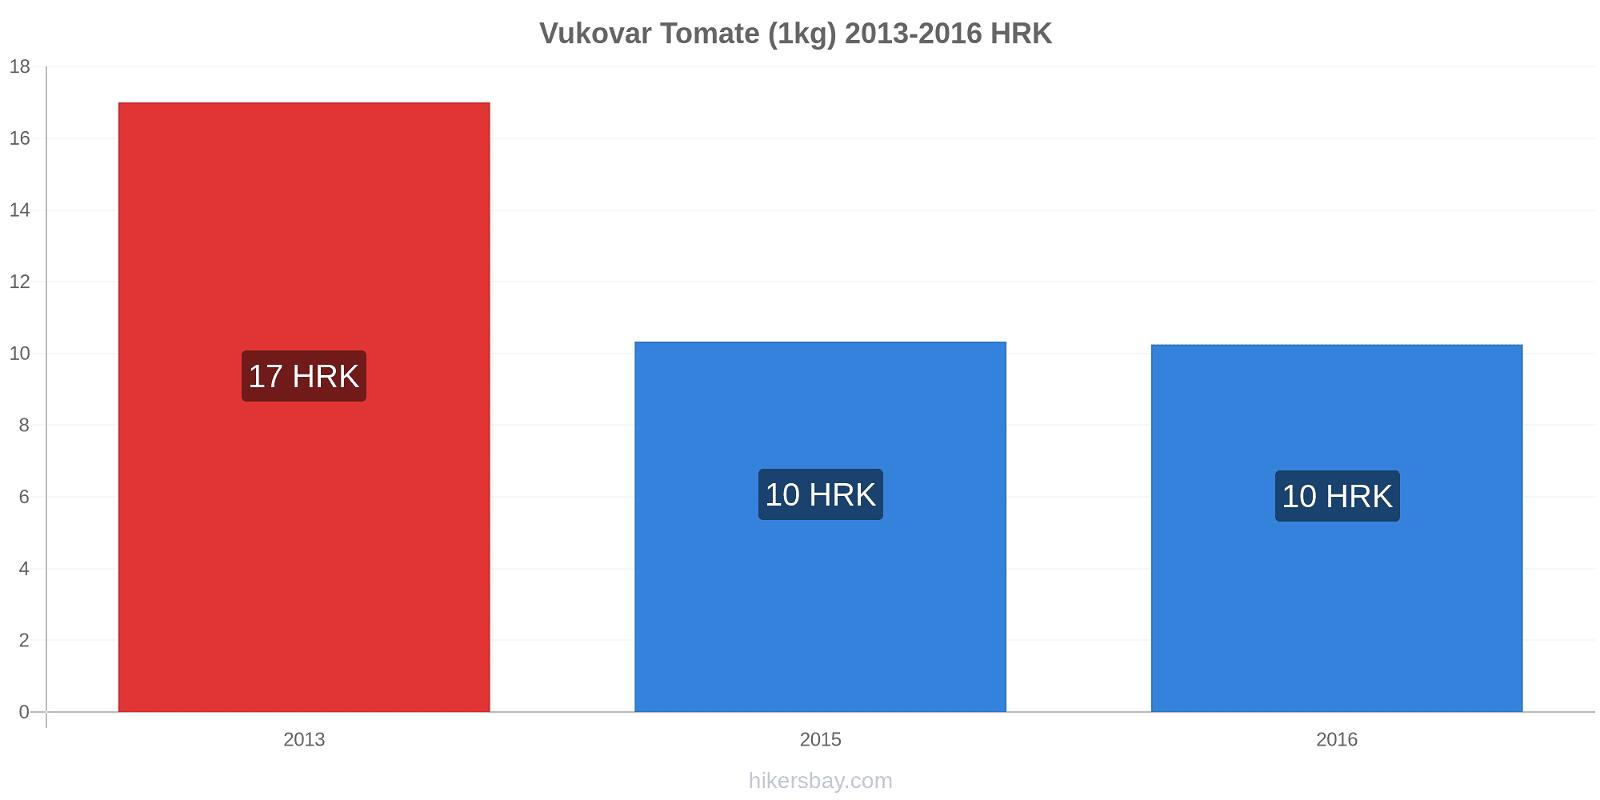 Vukovar cambios de precios Tomate (1kg) hikersbay.com